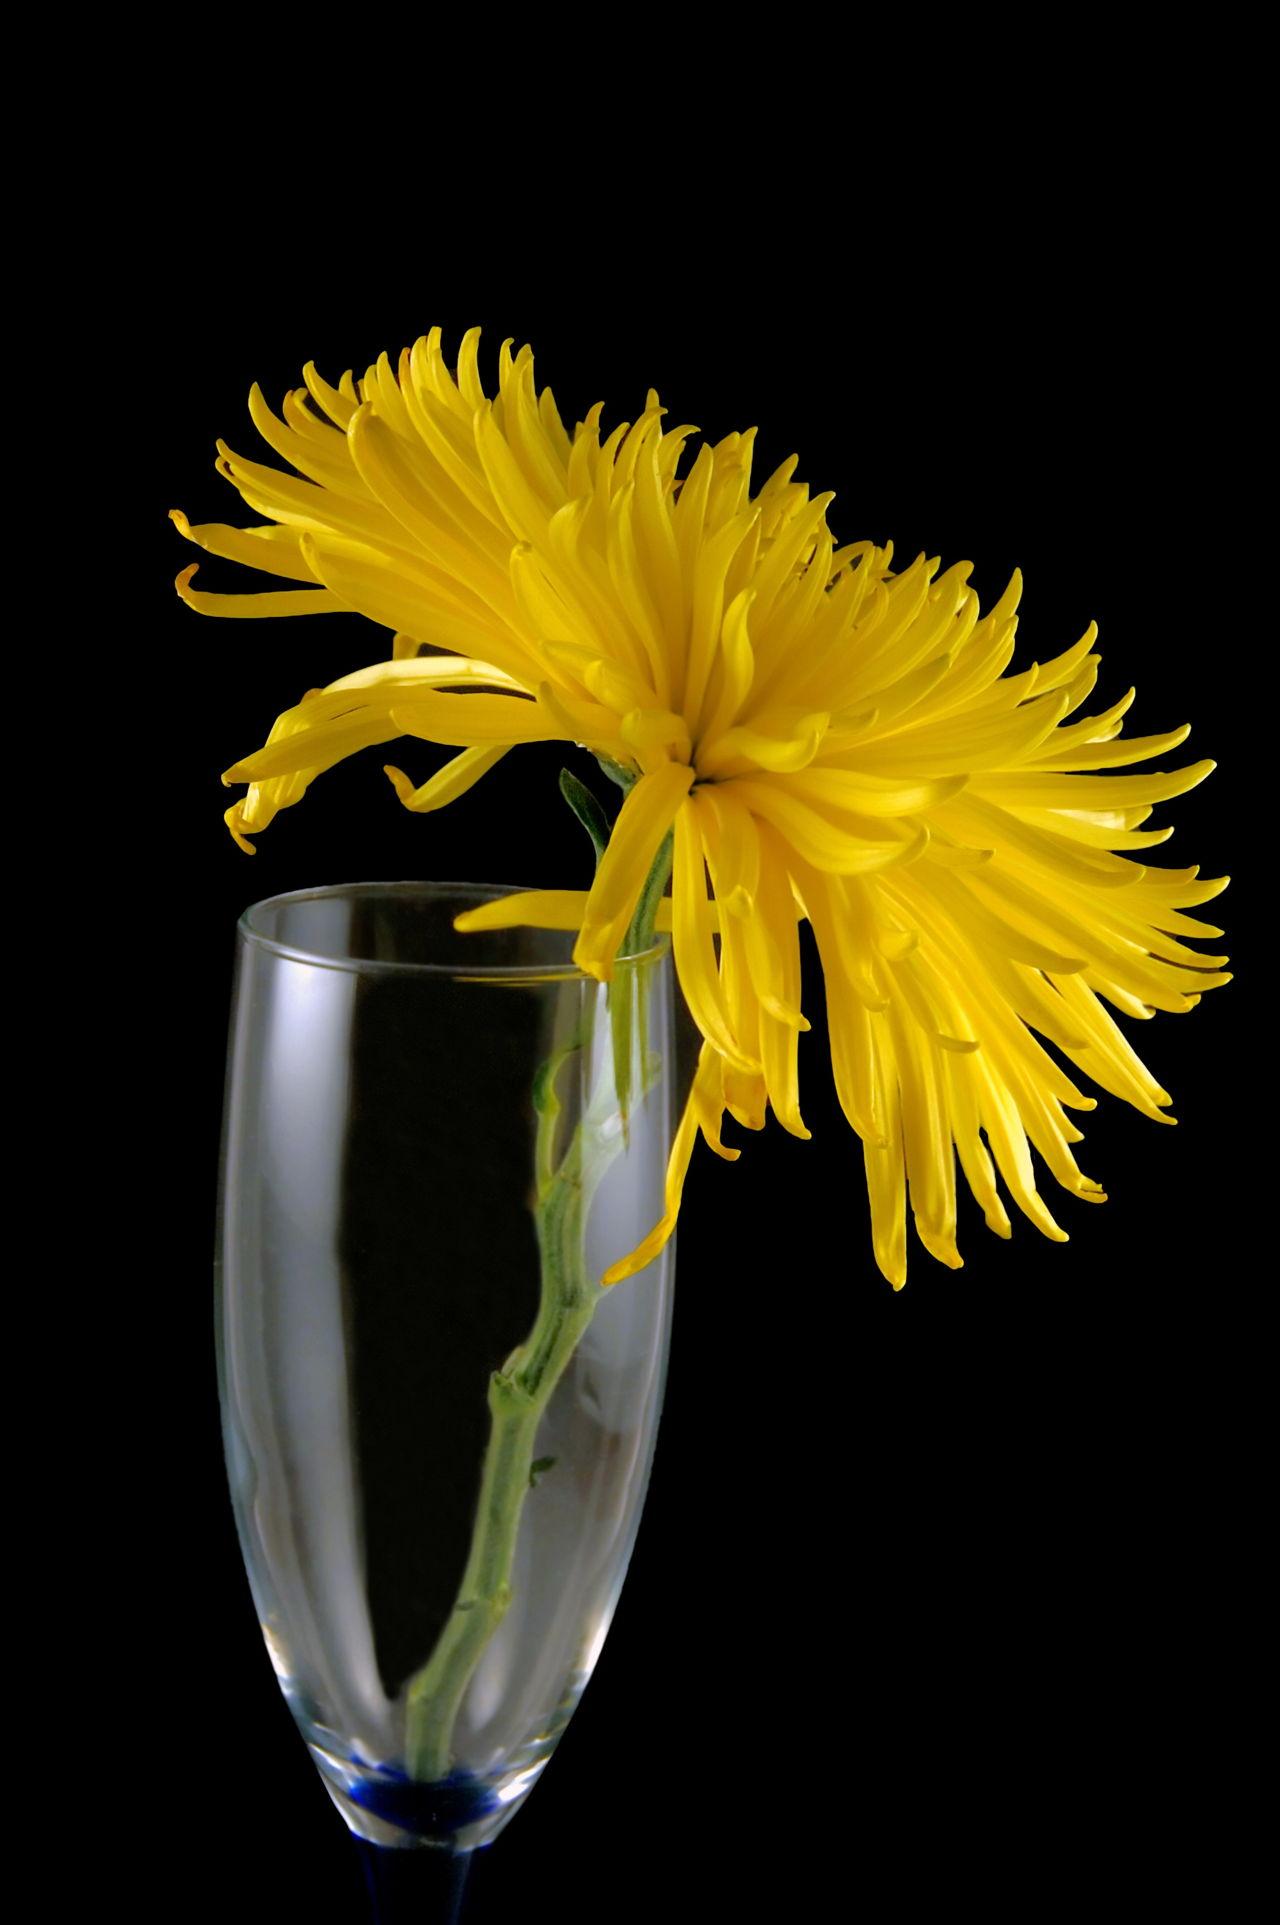 Chrysanthemum Tea Side Effects